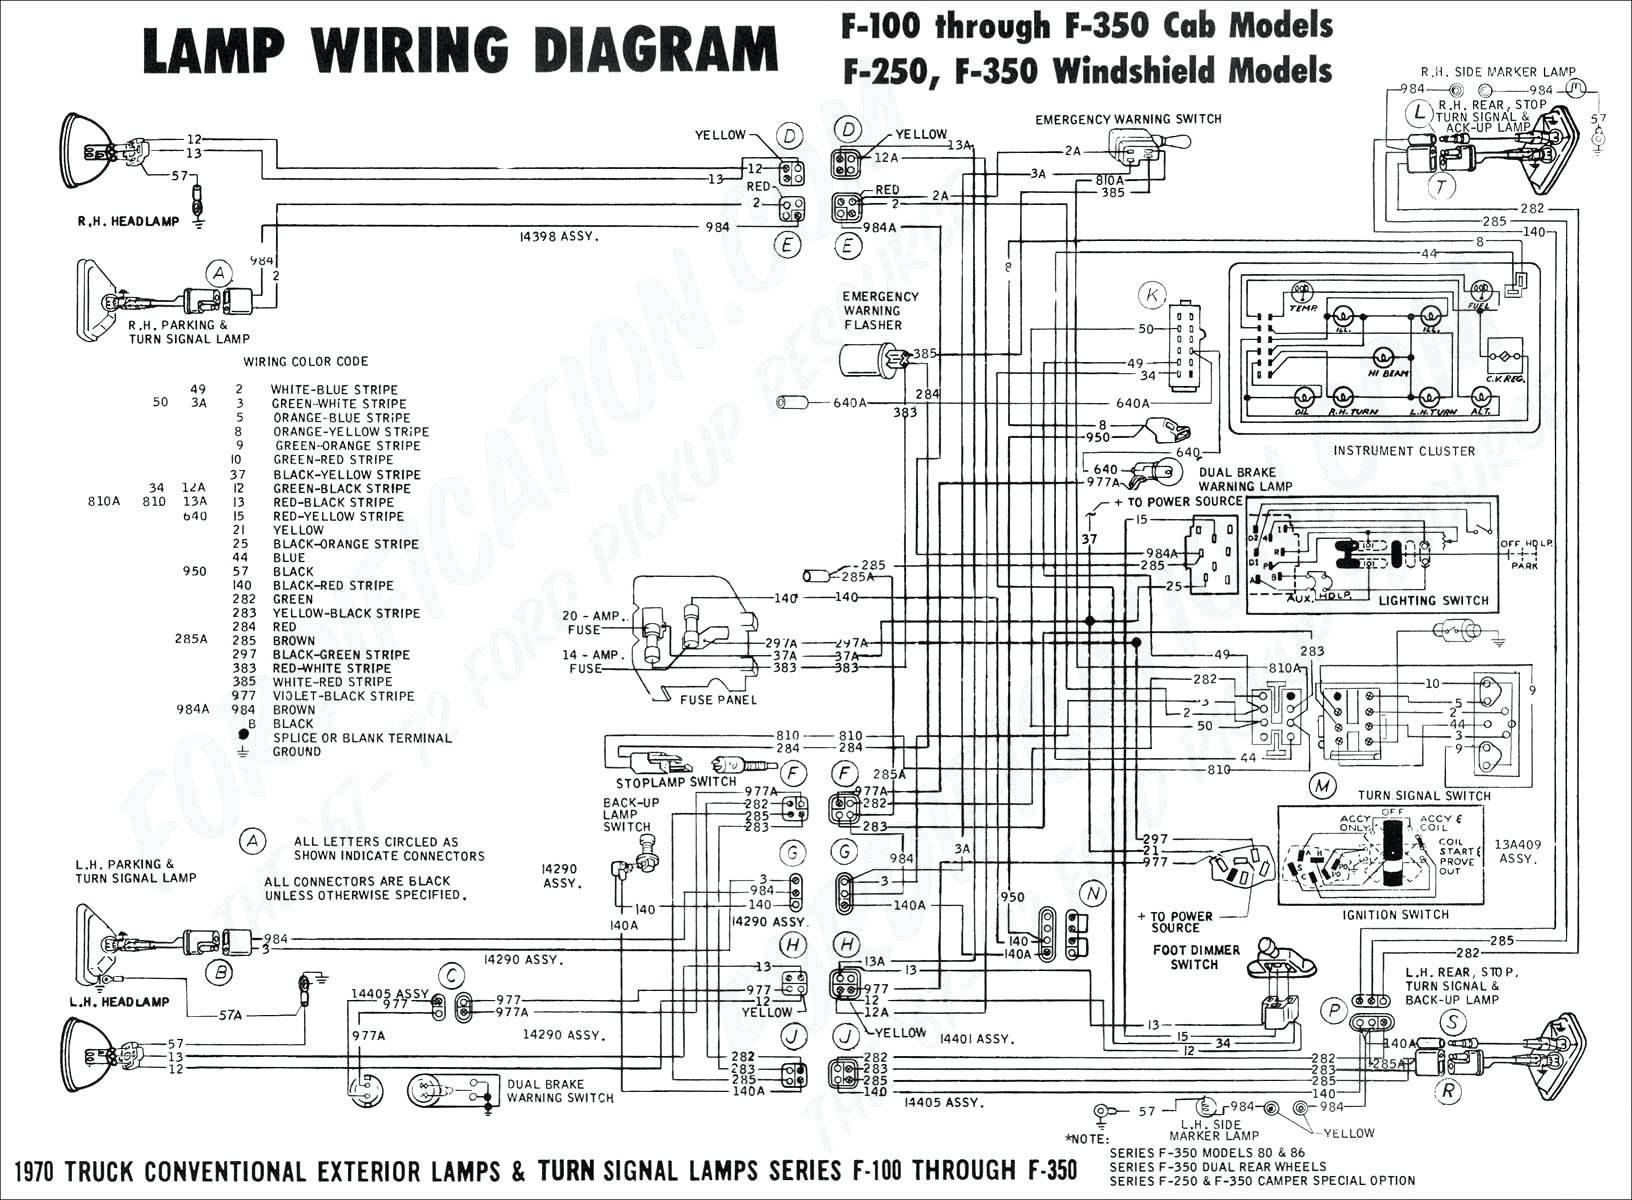 Briggs Stratton Small Engine Parts Diagram Briggs and Stratton Ignition System Diagram Worksheet and Wiring Of Briggs Stratton Small Engine Parts Diagram